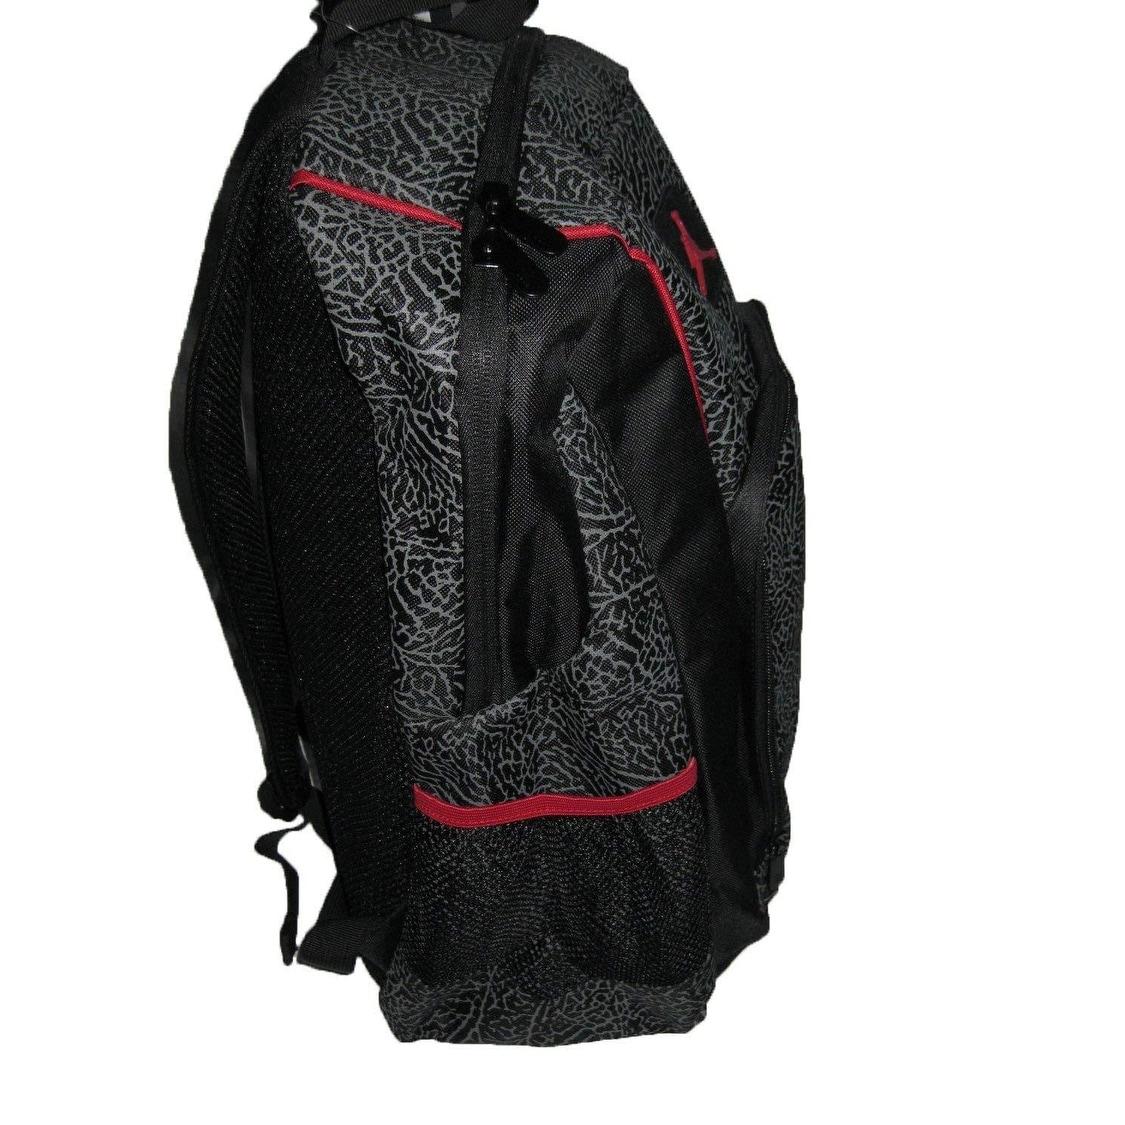 5974b3ac3e86 Nike Backpack Black And Red- Fenix Toulouse Handball